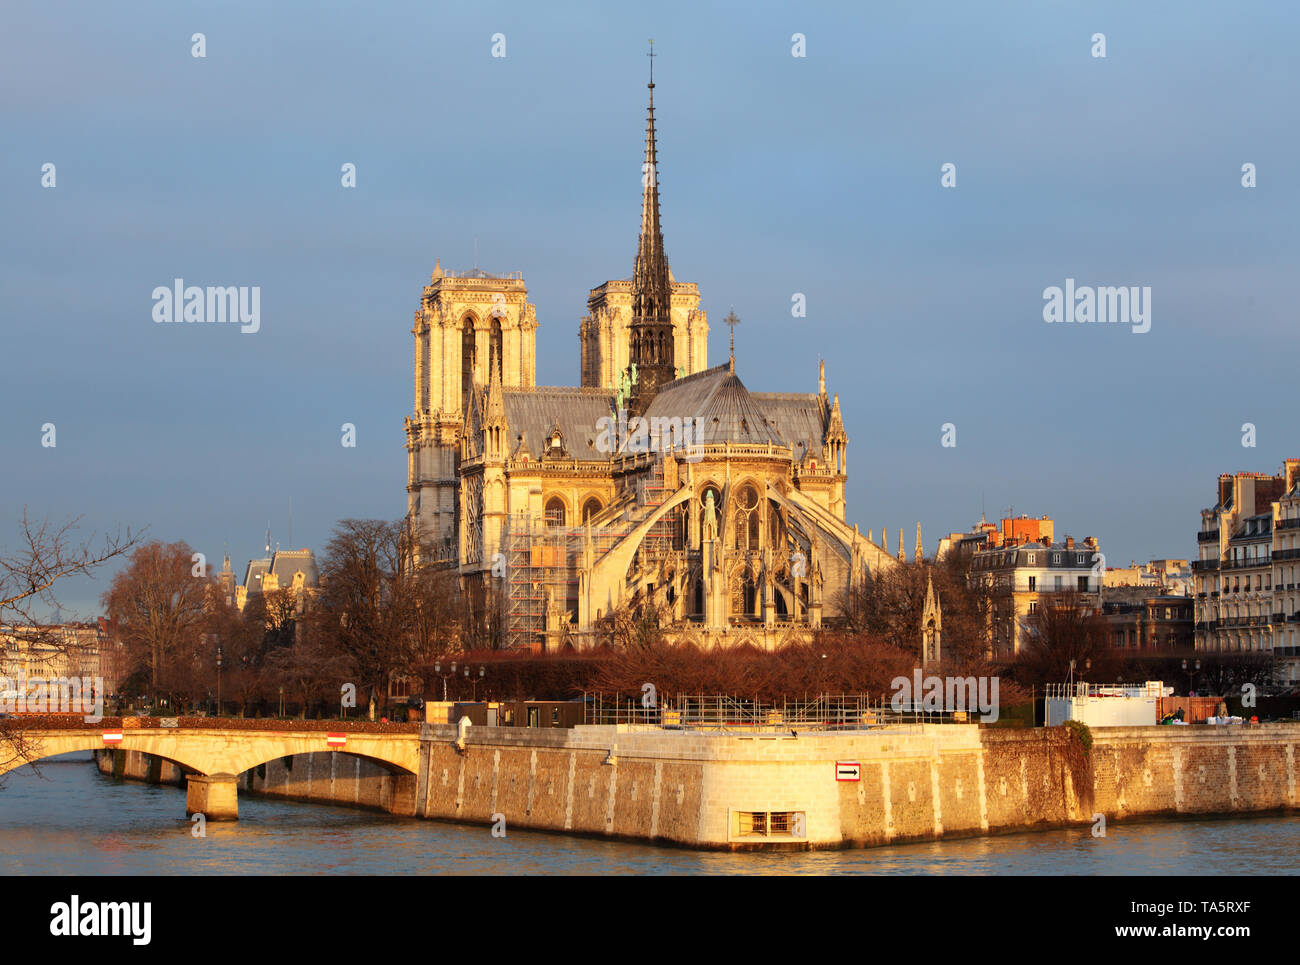 Notre Dame at sunrise - Paris, France - Stock Image